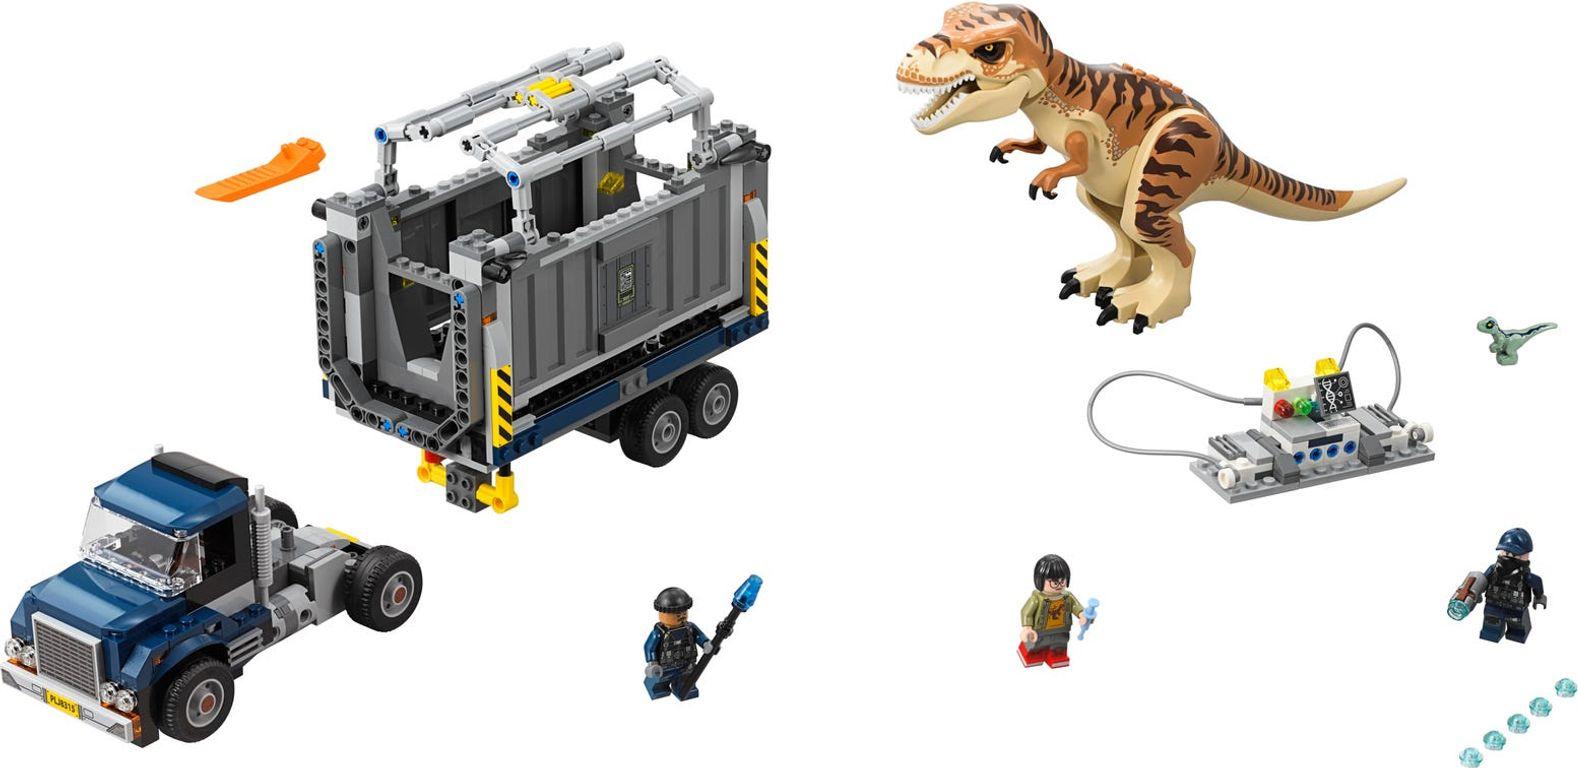 LEGO® Jurassic World T. rex Transport components